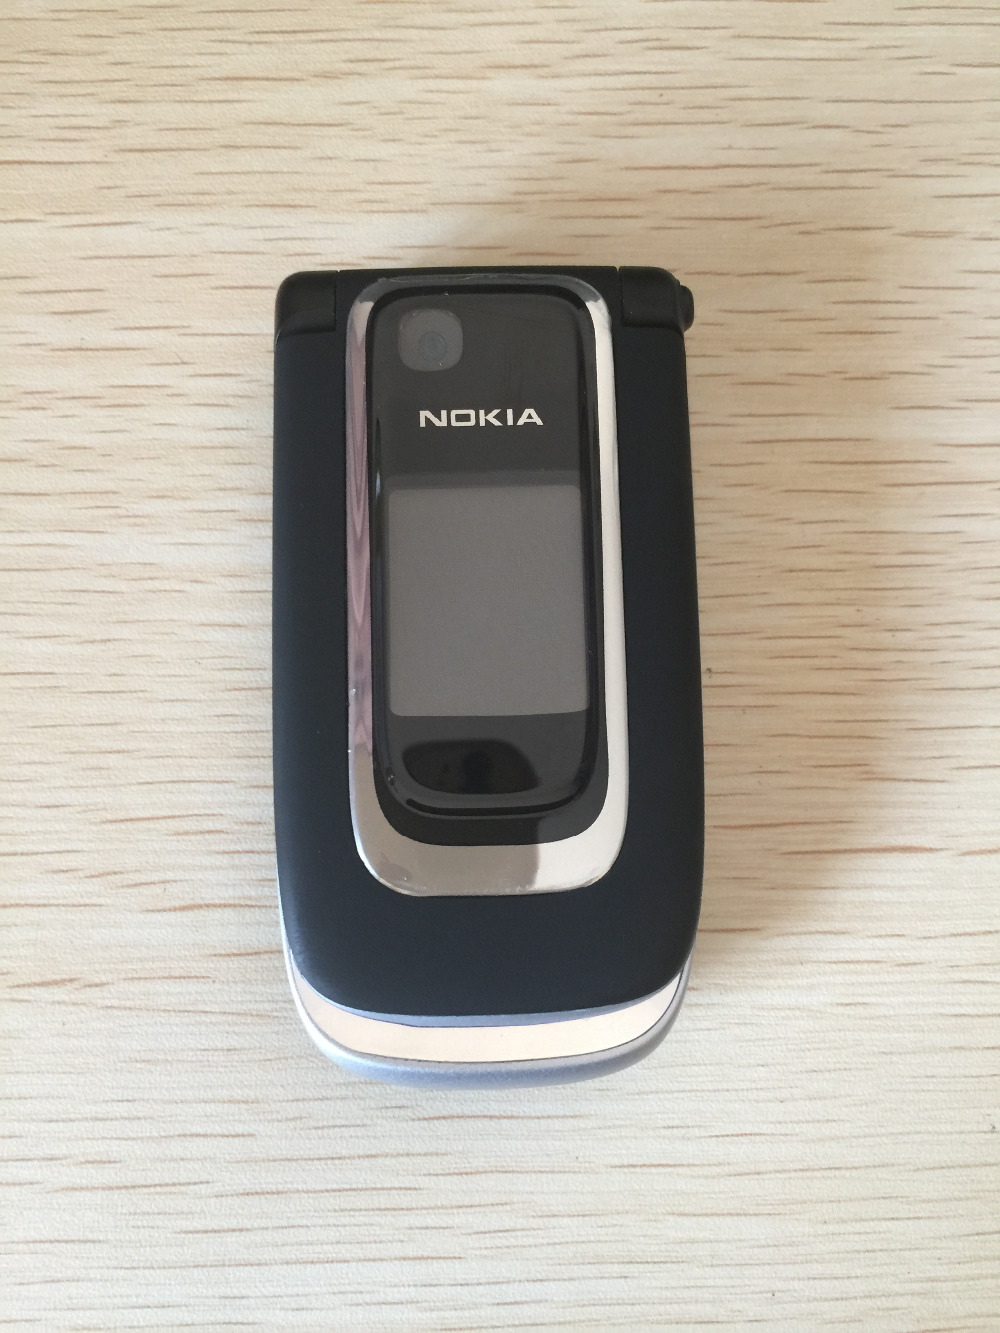 Nokia لوحات FM متعددة 2